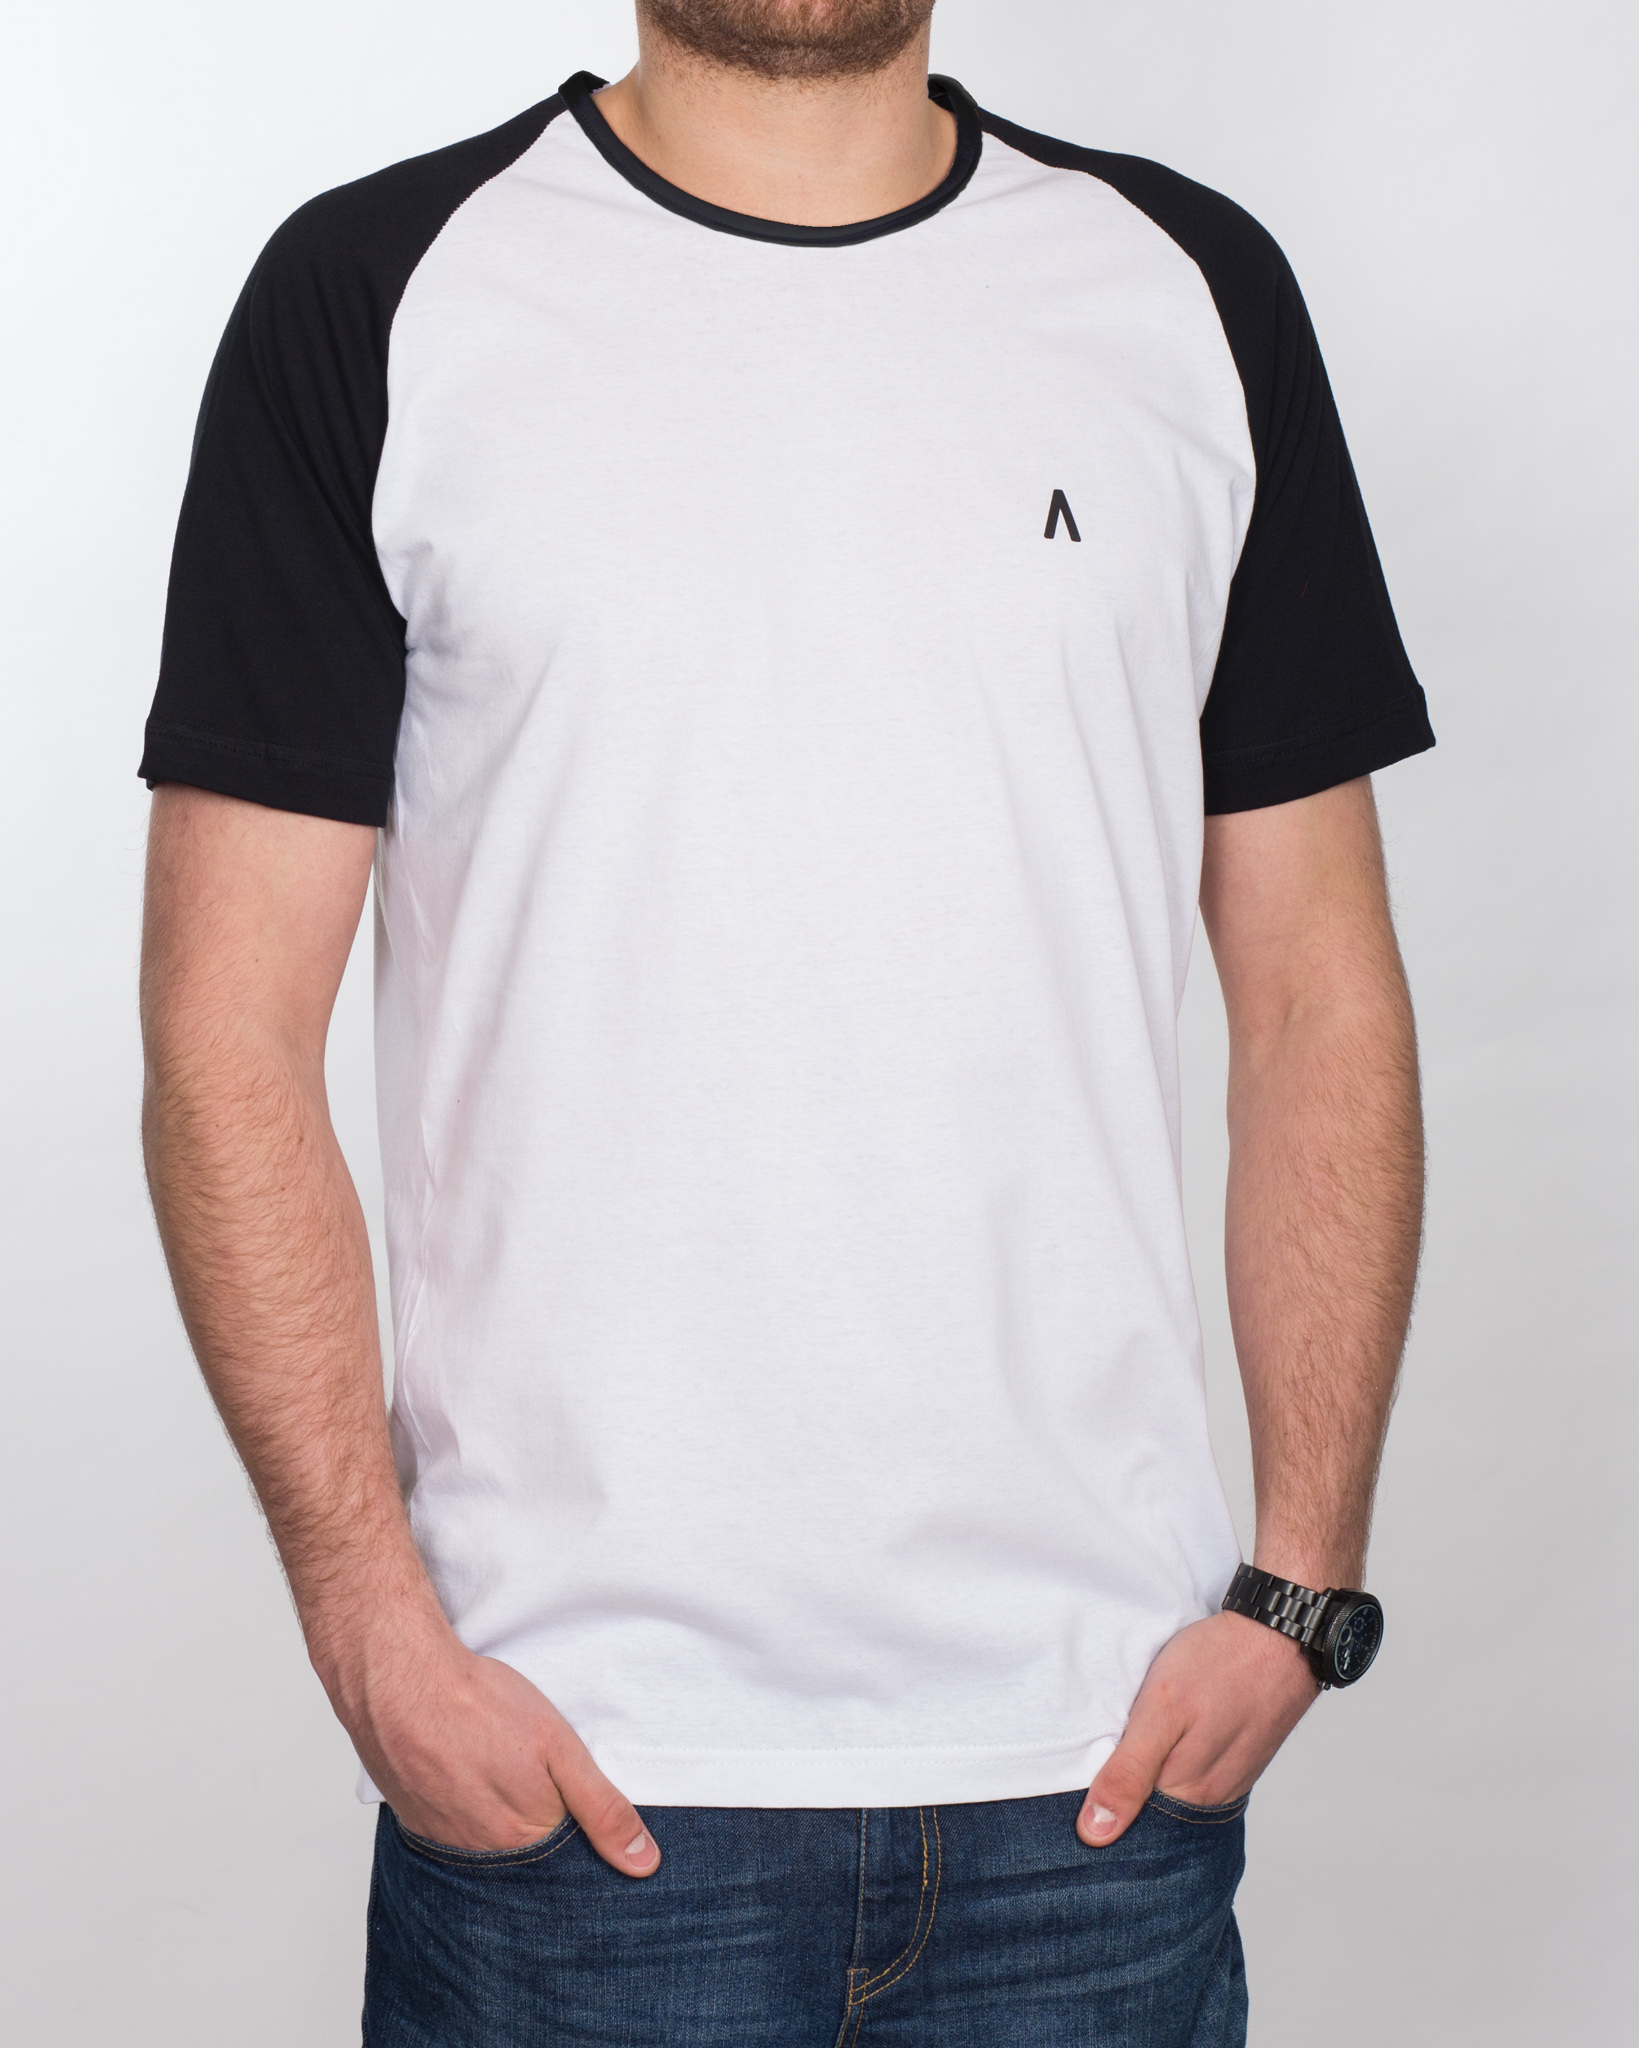 2t Raglan Tall T-Shirt (white/black)